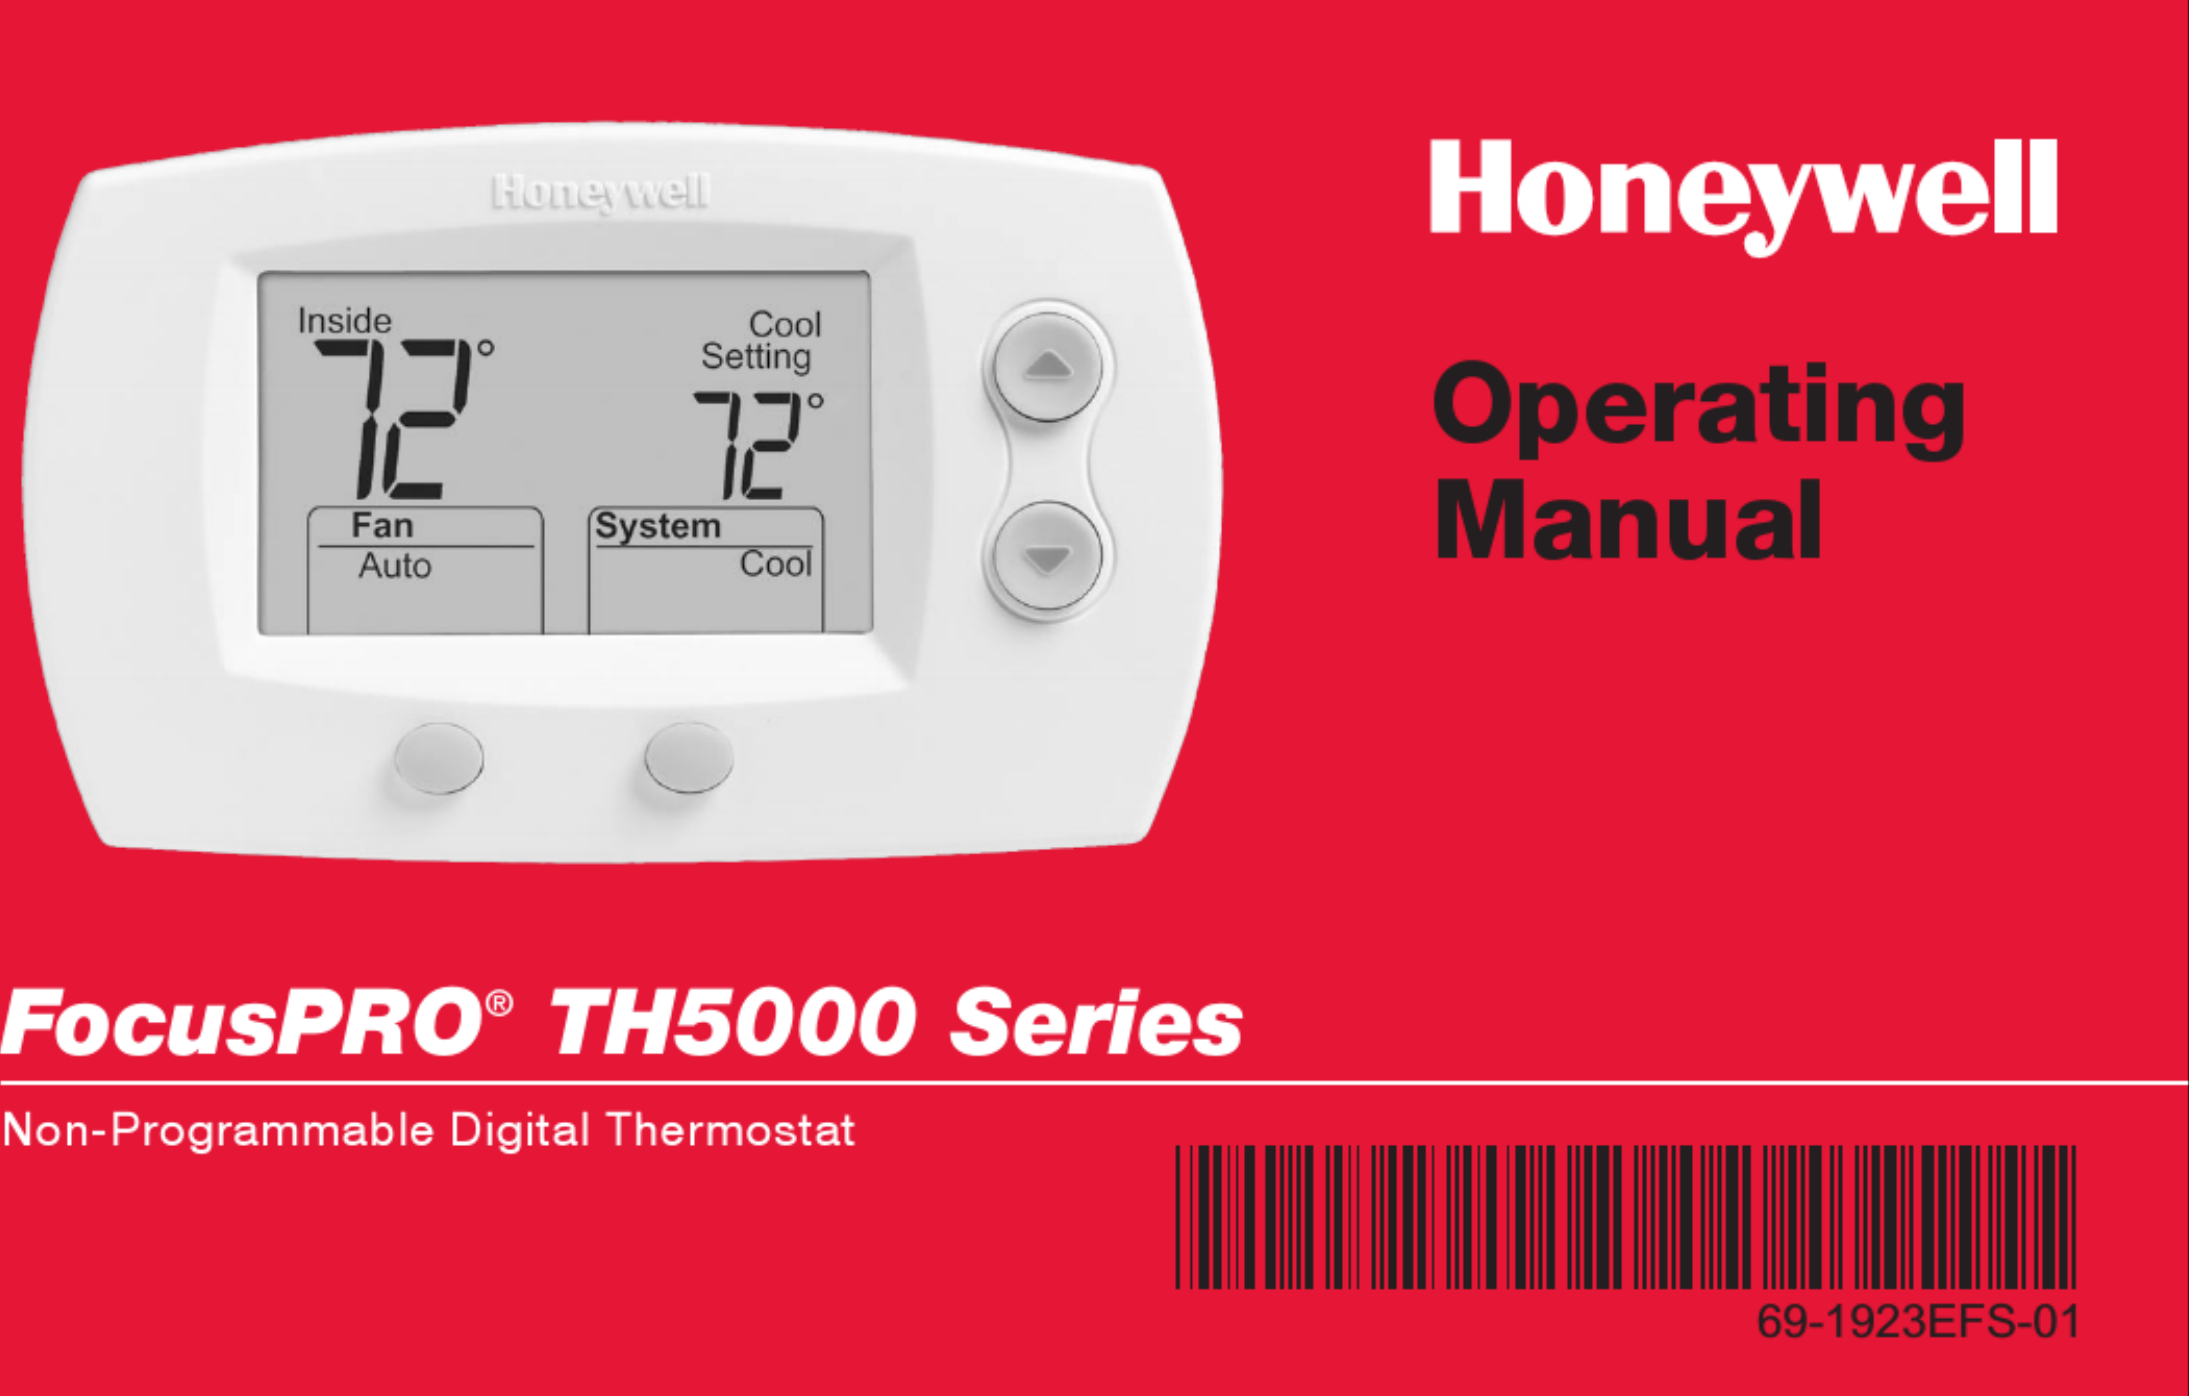 Honeywell Focuspro Th5000 Series Operating Manual 1002805 User | Th5000 Honeywell T Stat Wiring Diagram |  | UserManual.wiki